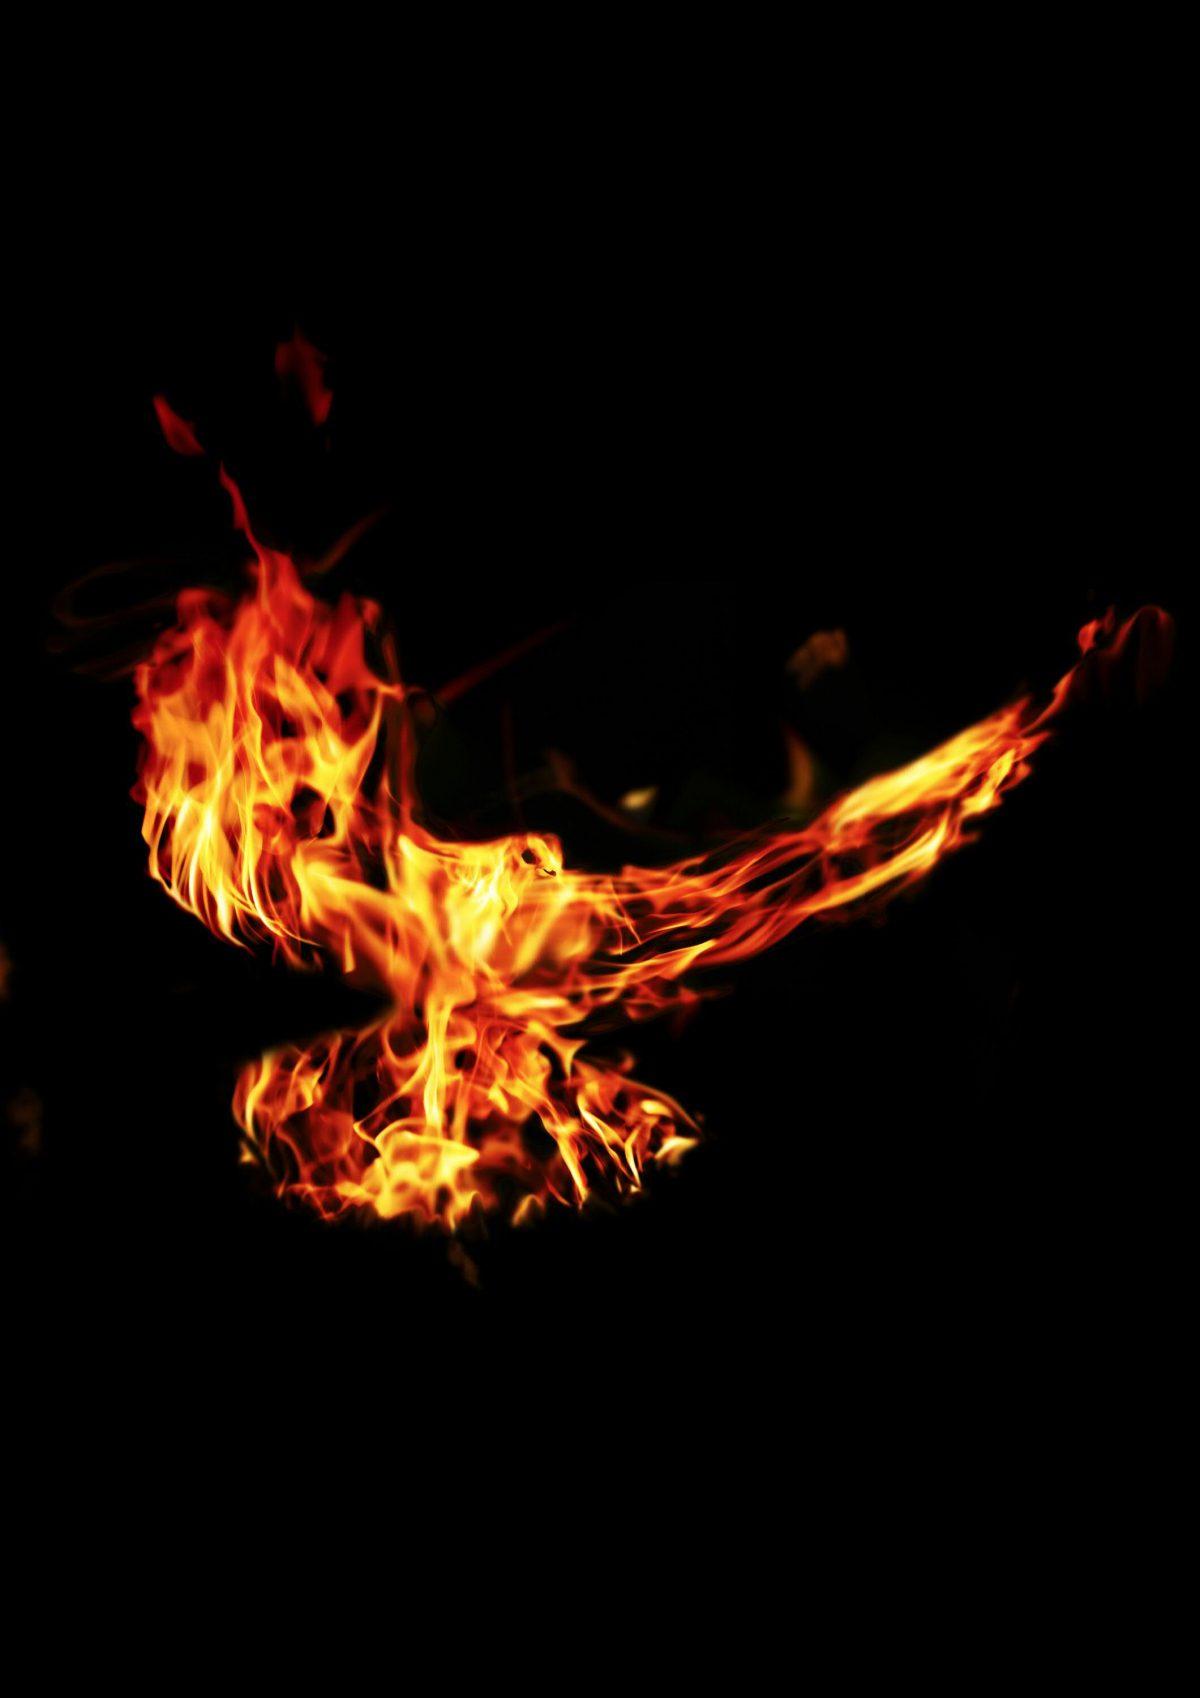 Spirit_of_God___Fire